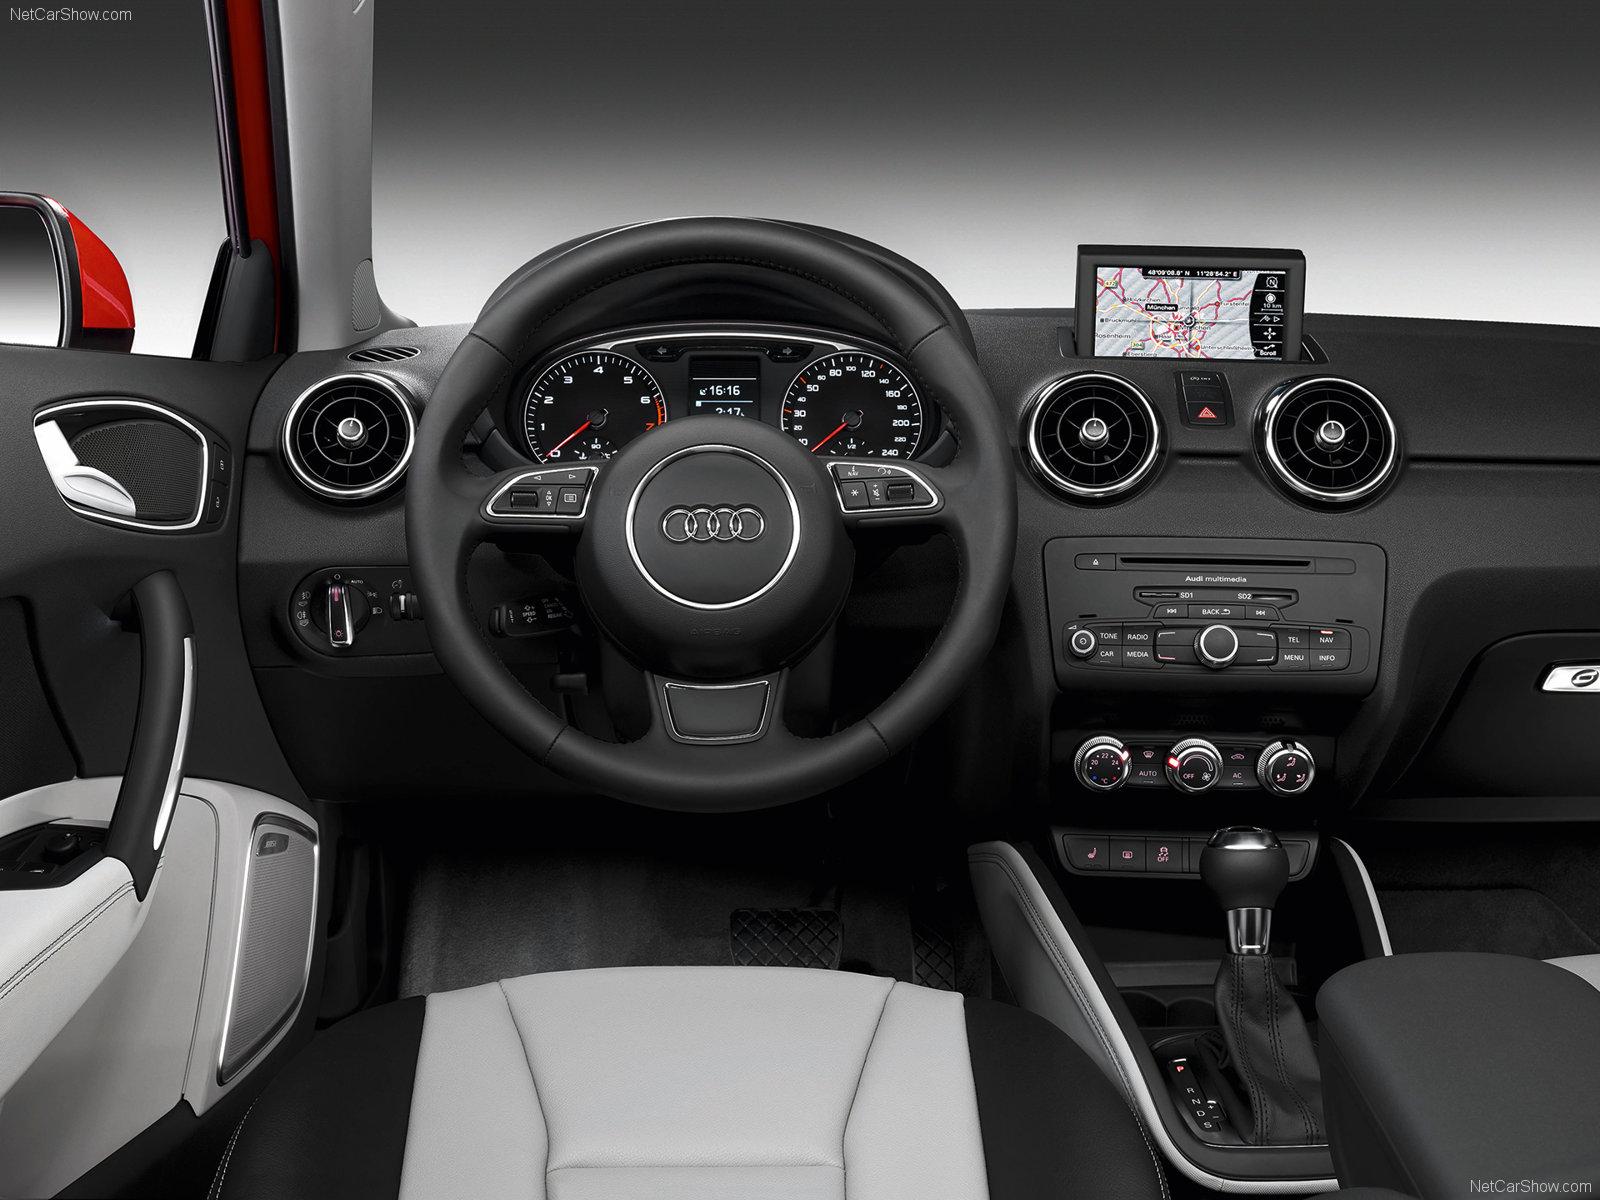 3dtuning Of Audi A1 3 Door Hatchback 2011 3dtuning Com